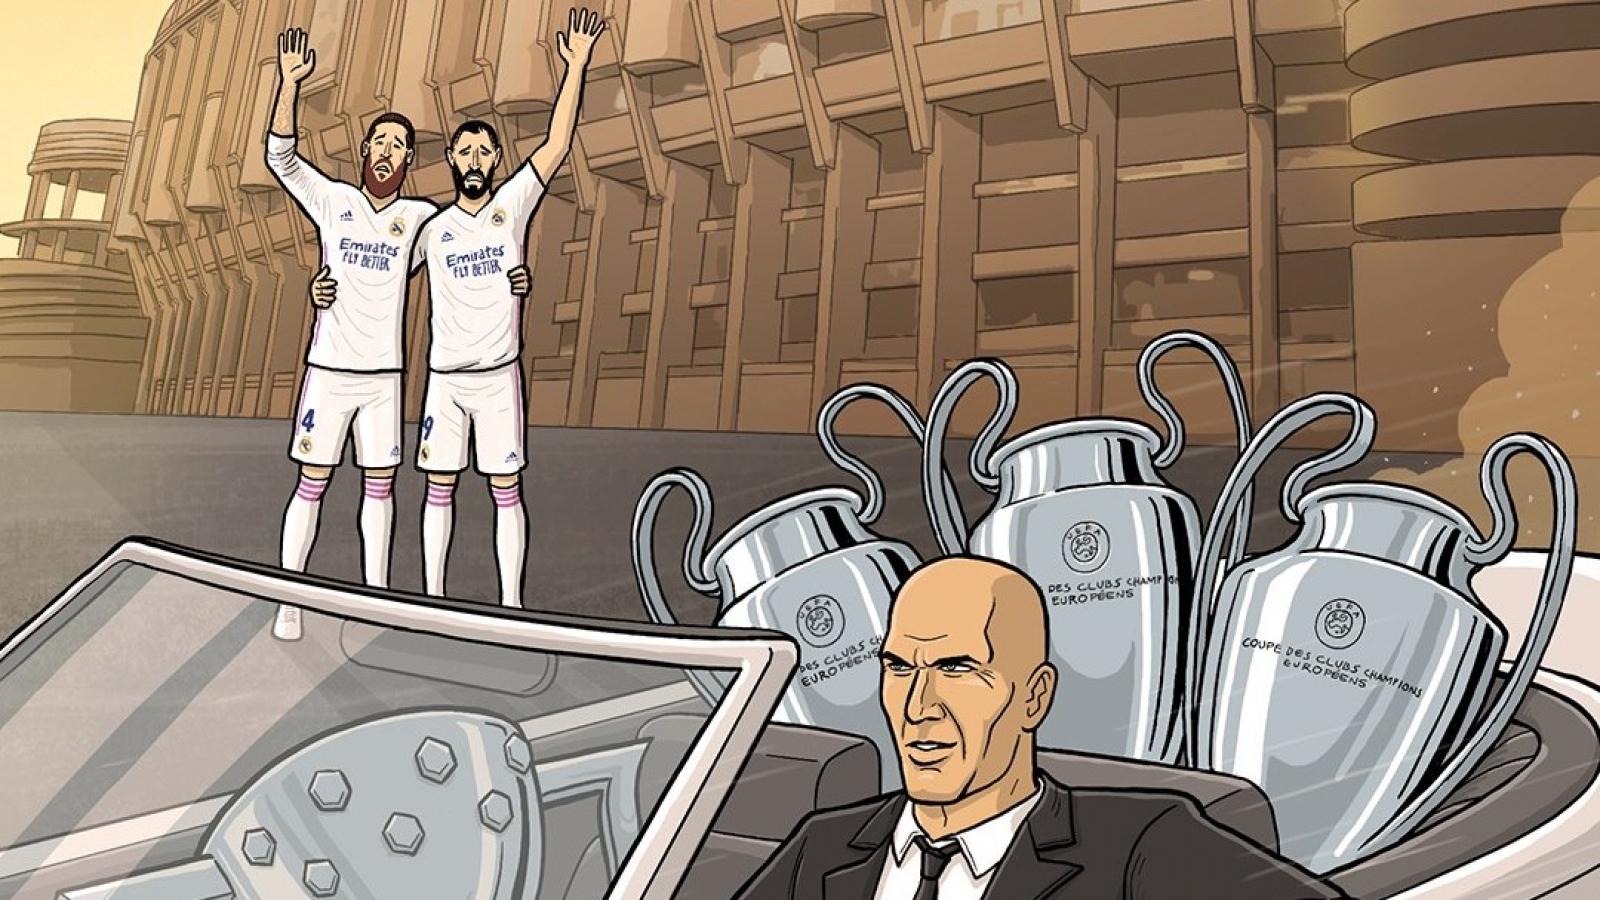 Biếm họa 24h: HLV Zidane nói lời chia tay Real Madrid